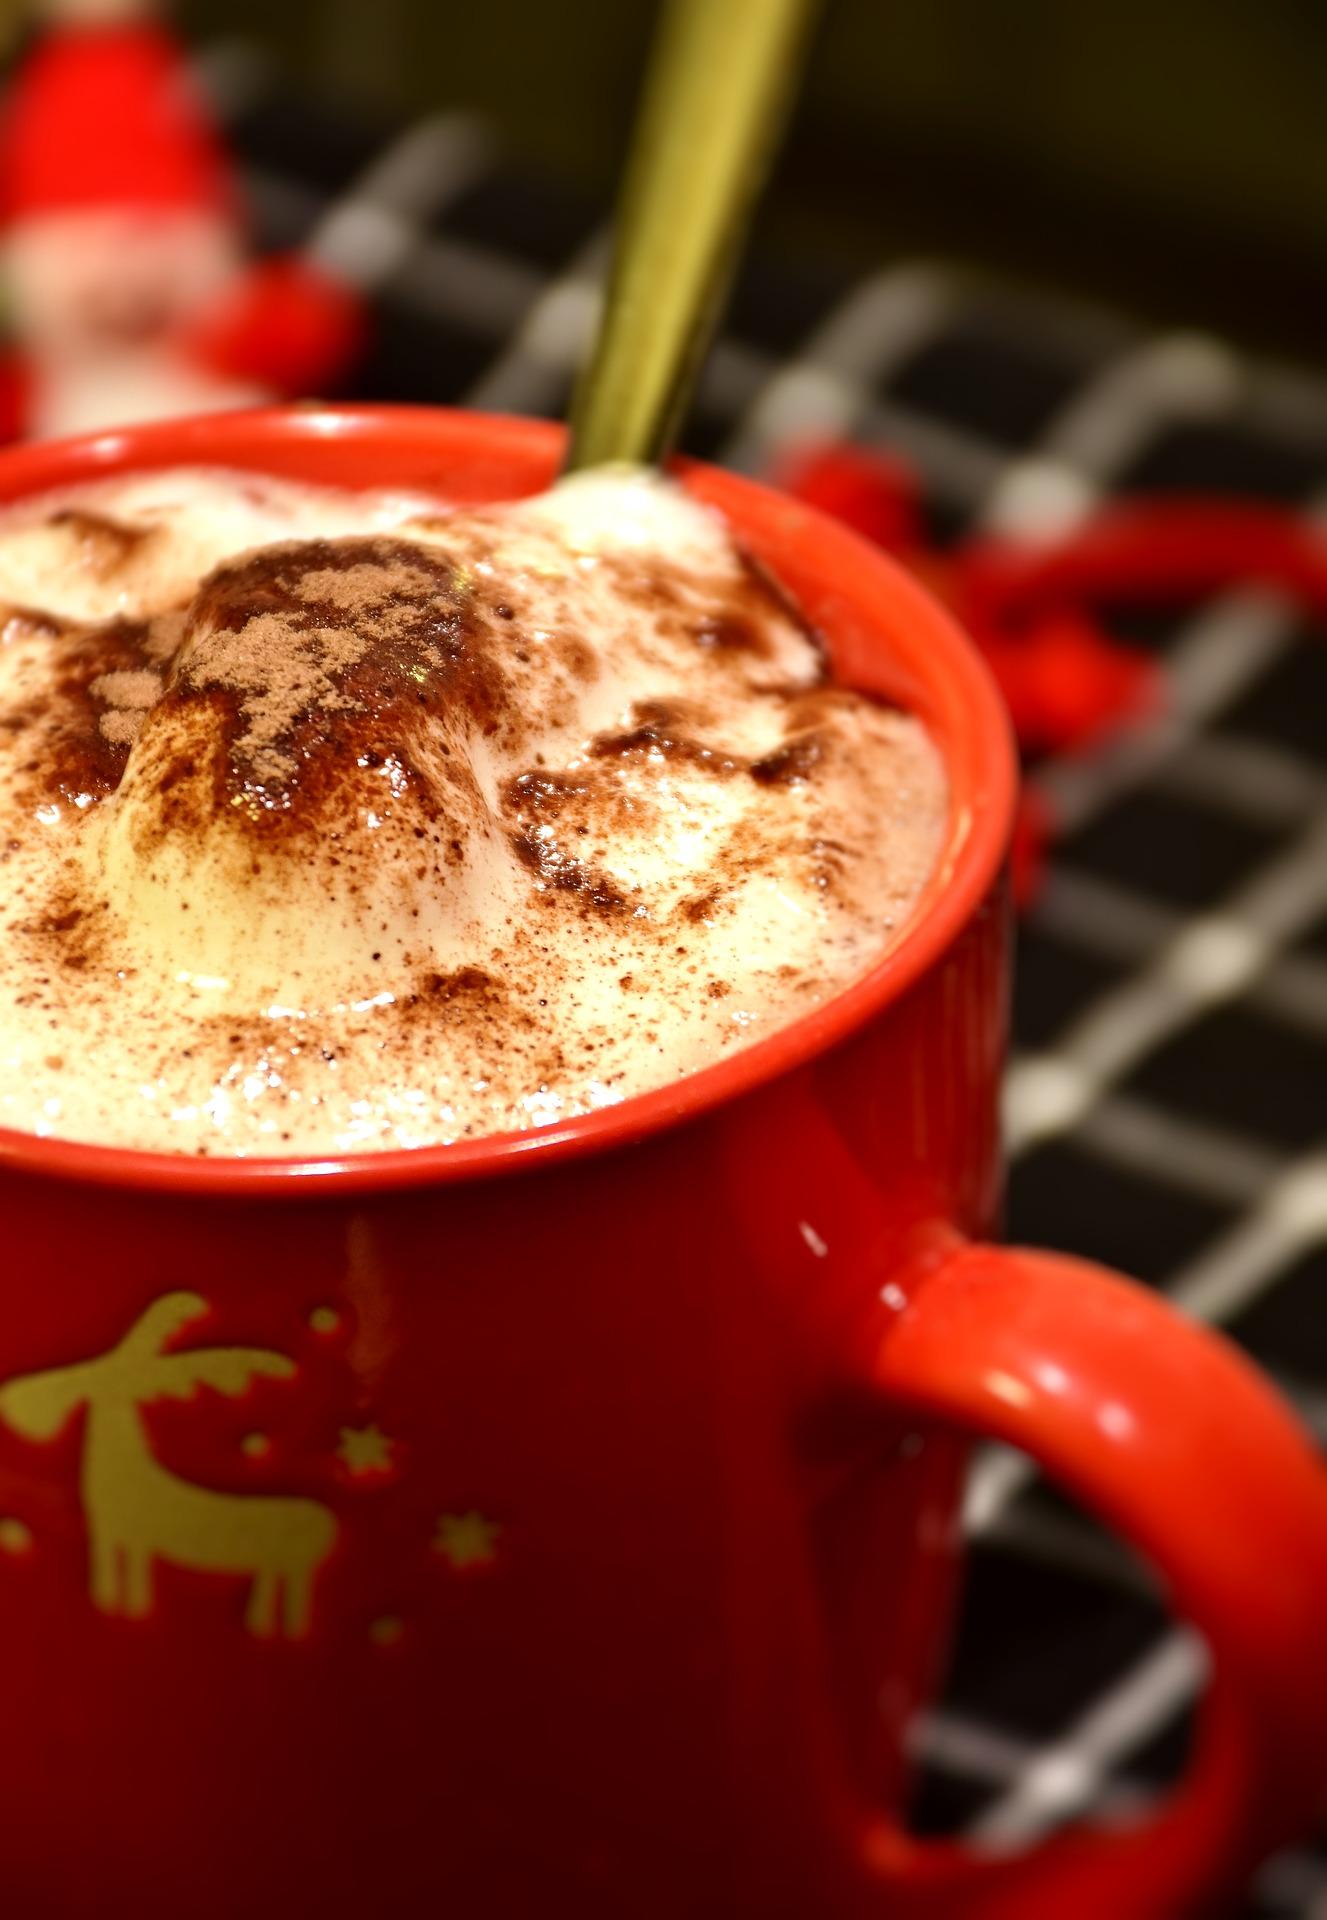 Schokoladen Mug Cake mit Erdnussbutter Topping (Tassenkuchen)